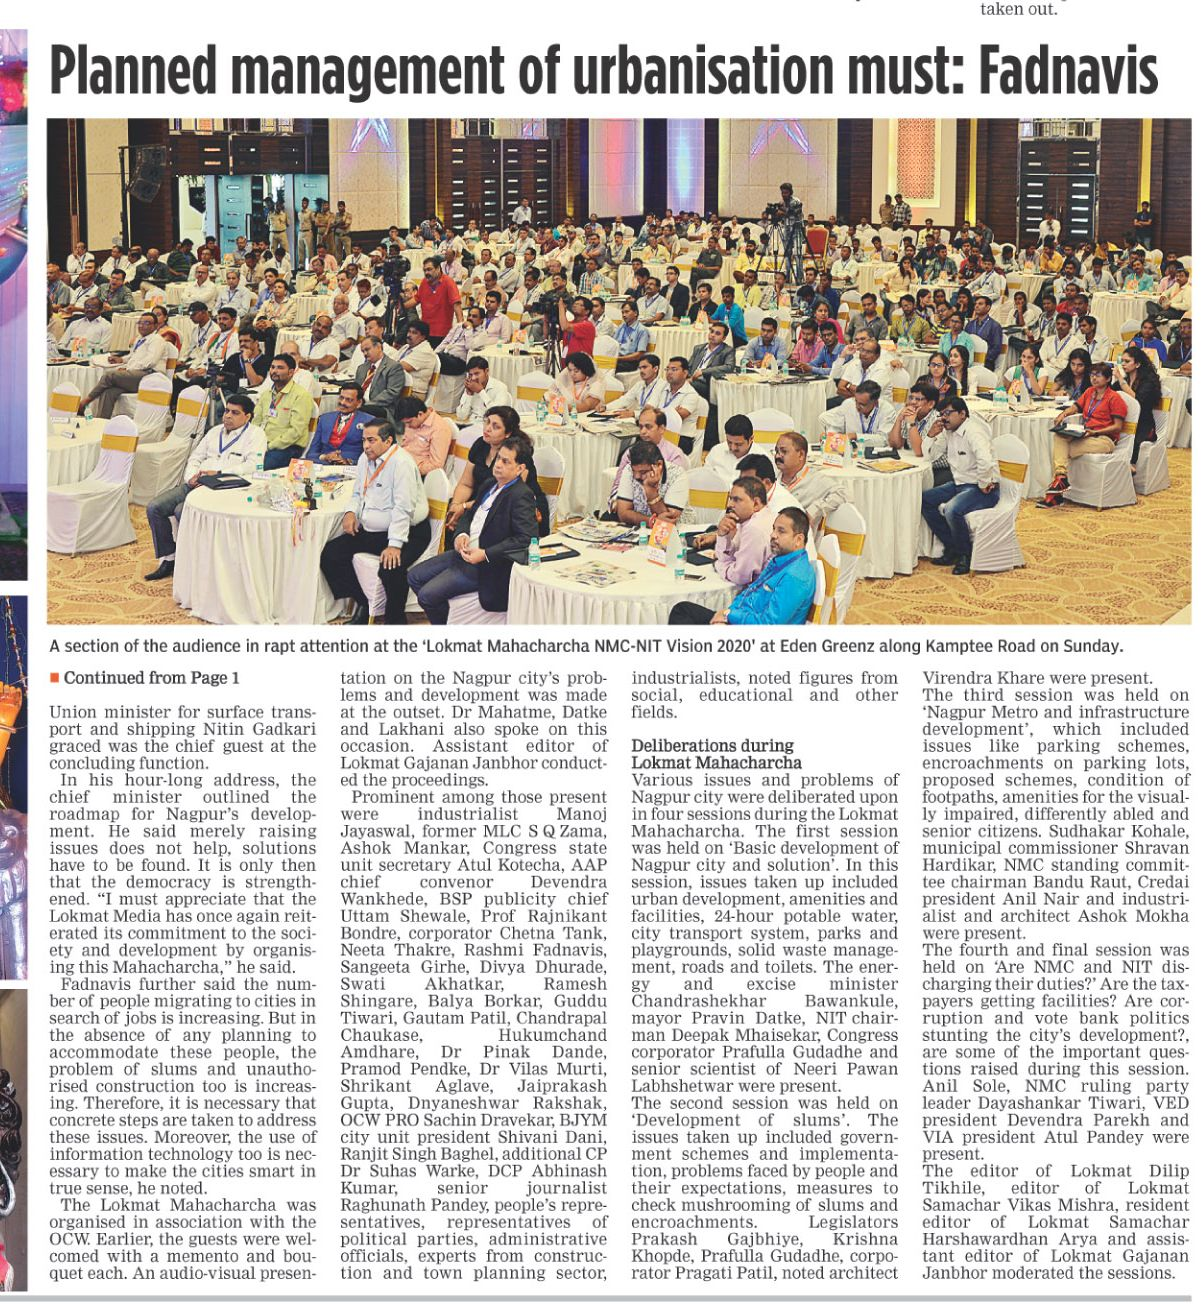 Planned management of urbanisation must: Fadnavis